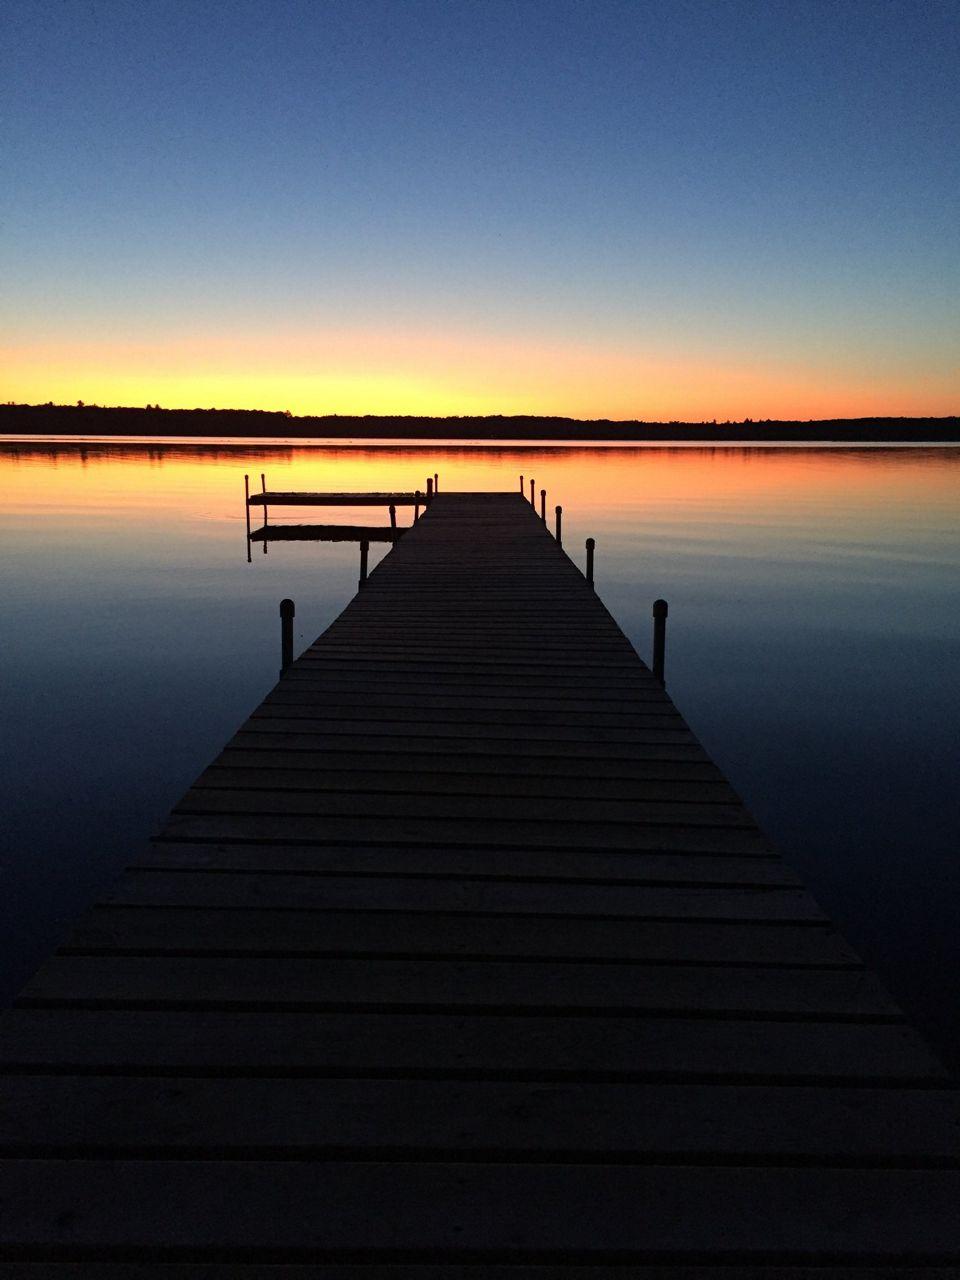 Sunrise/Sunset